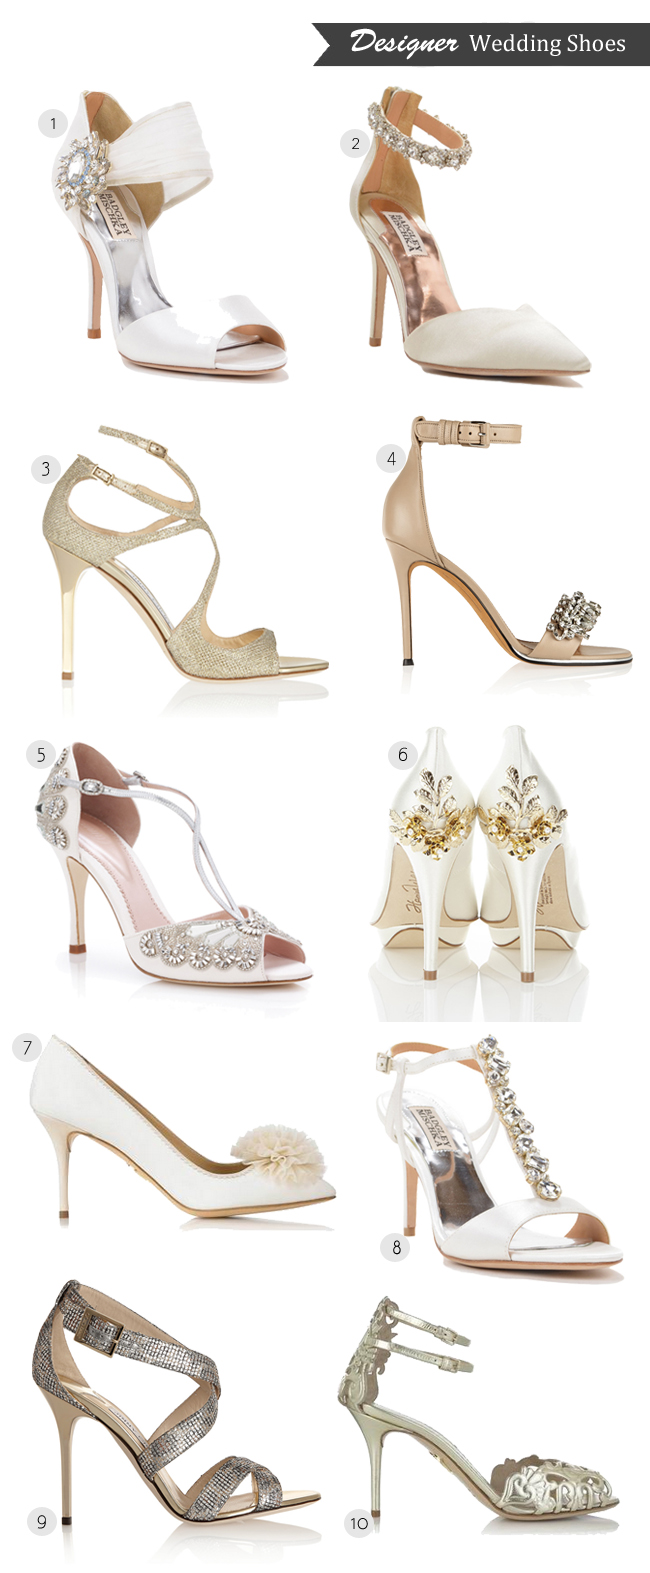 designer-wedding-shoes